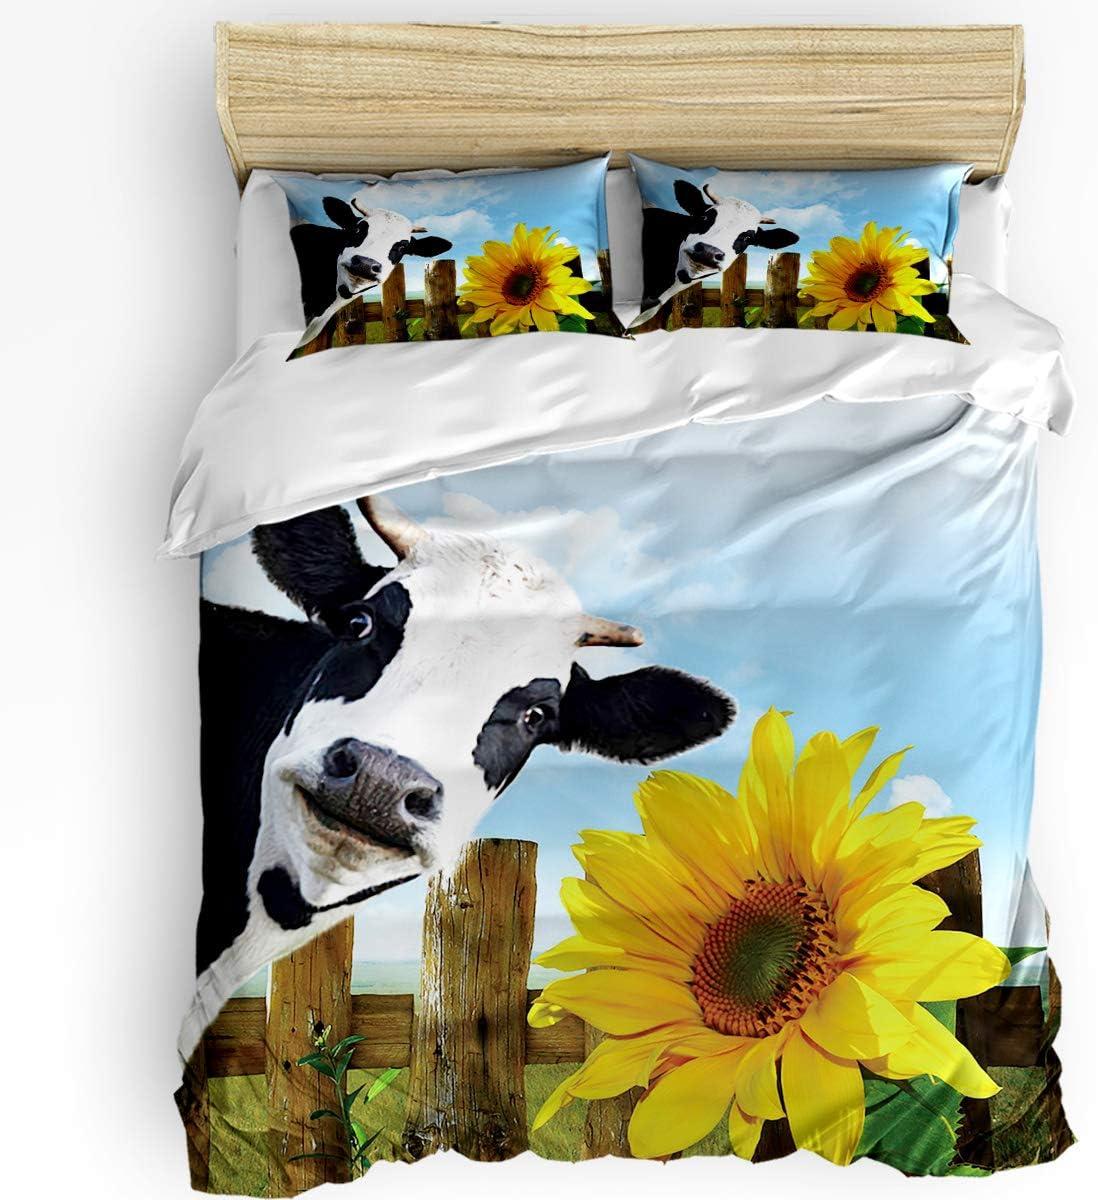 Outlet SALE SUN-Shine Max 72% OFF 3 Pieces Bedding Duvet Cover Animals Sun Farmhouse Set